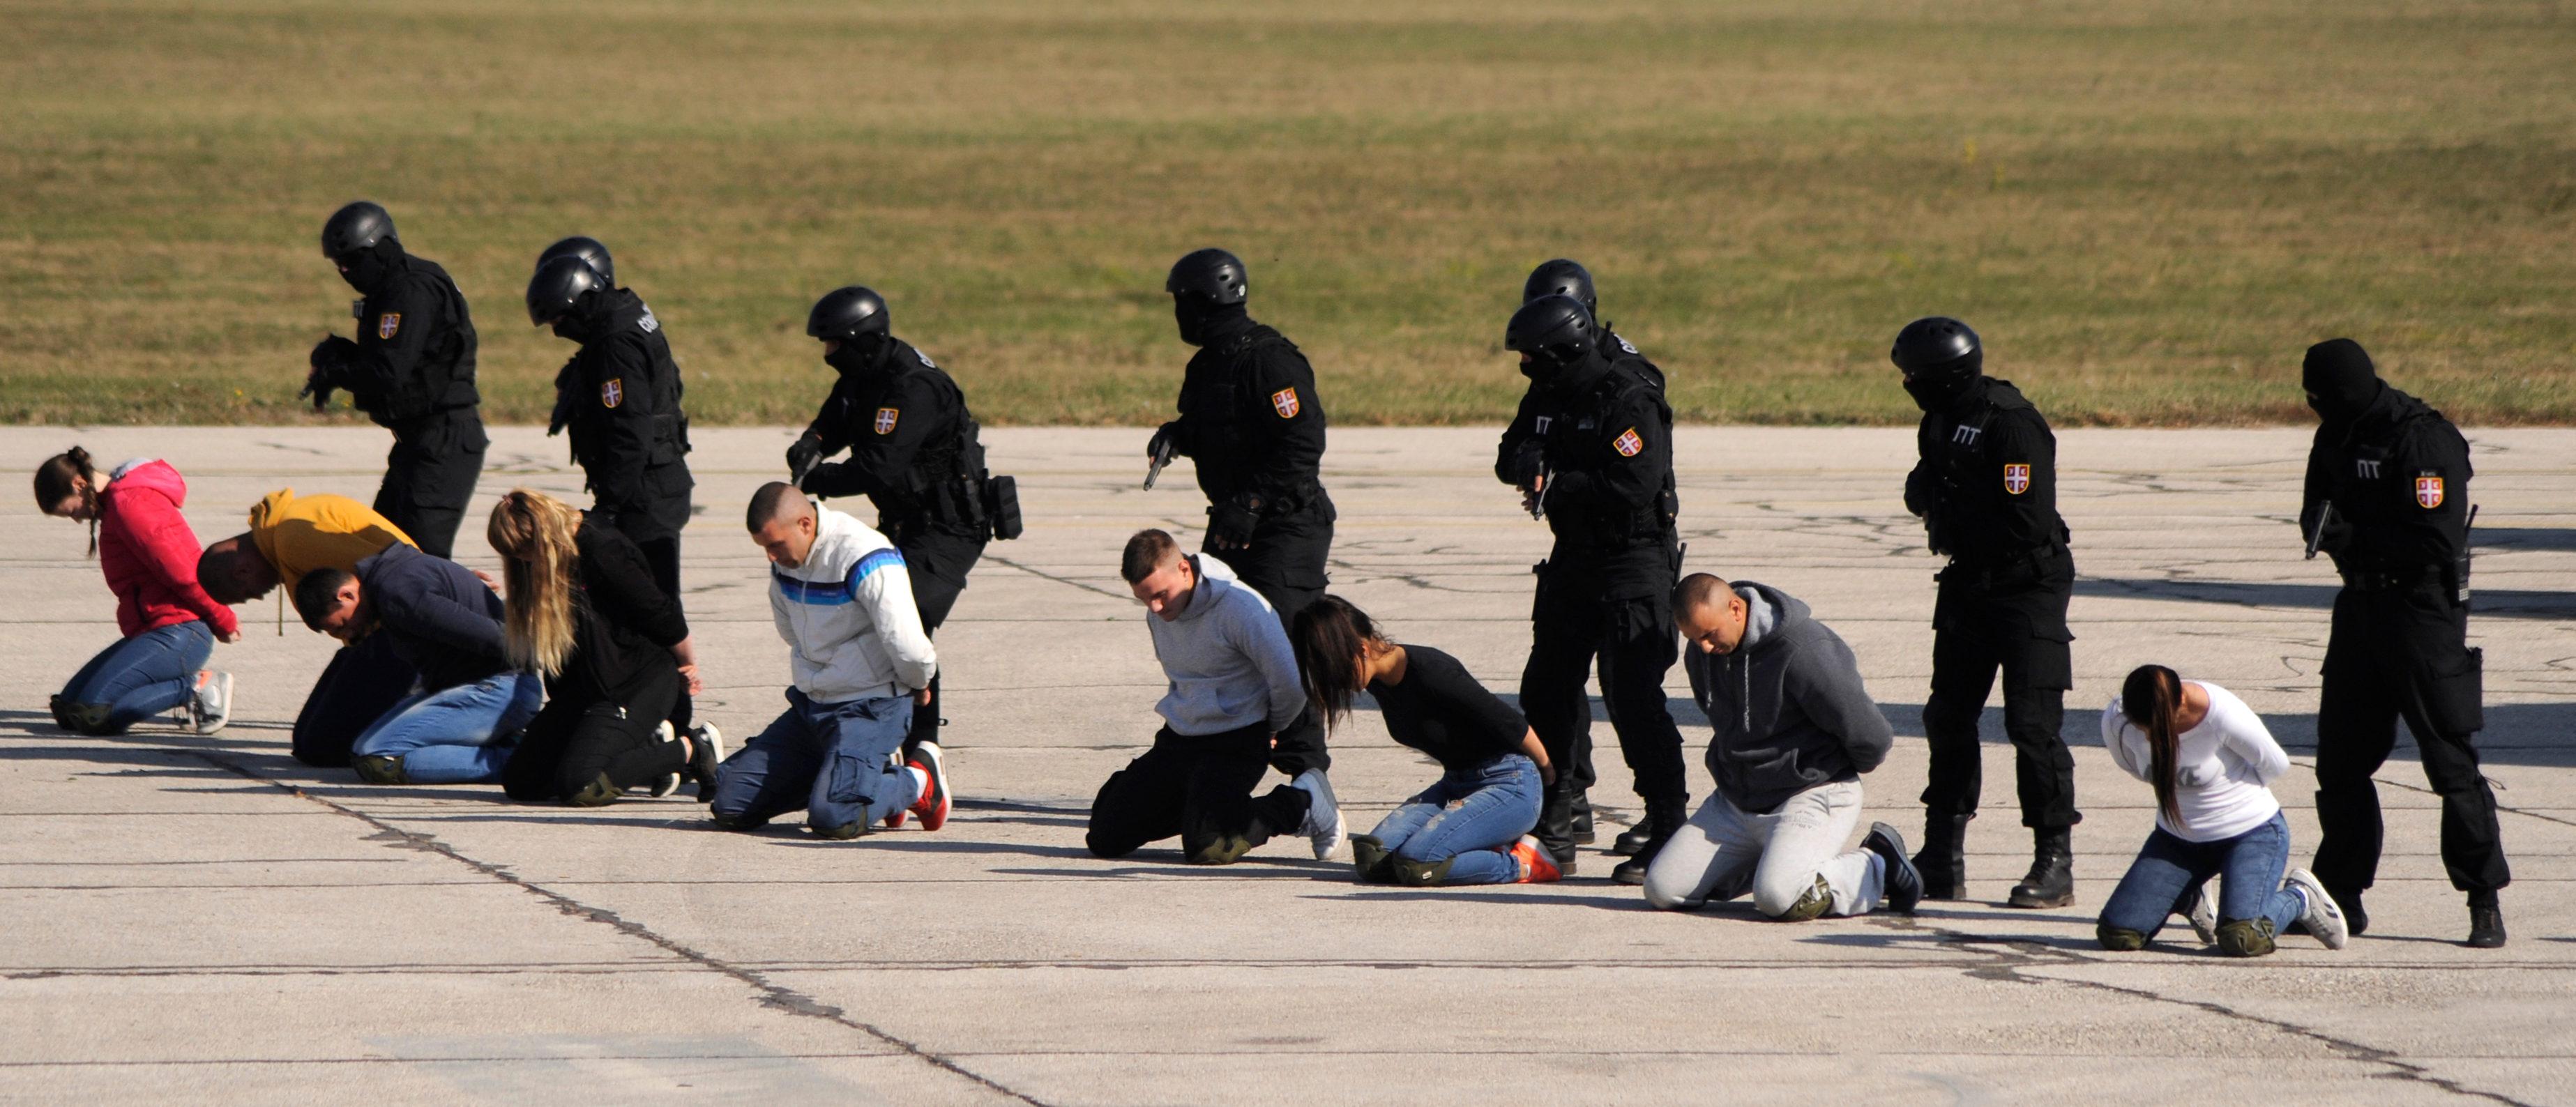 Arrested Suspects (Shutterstock/bibiphoto)